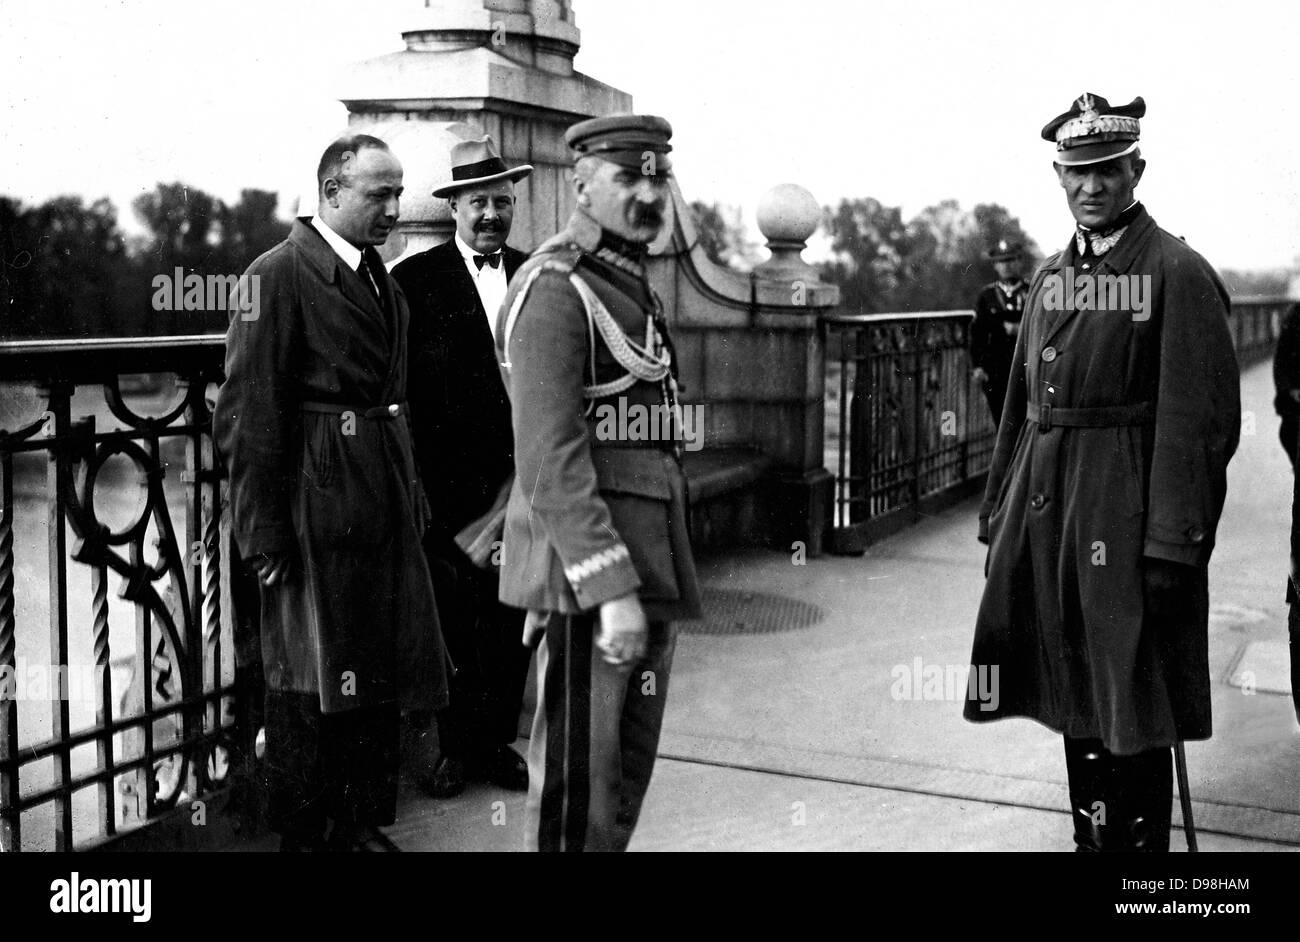 marshall Josef Pi?sudski on the Poniatowski Bridge, Warsaw, 12 May 1926, during the May Coup d' État. Also - Stock Image